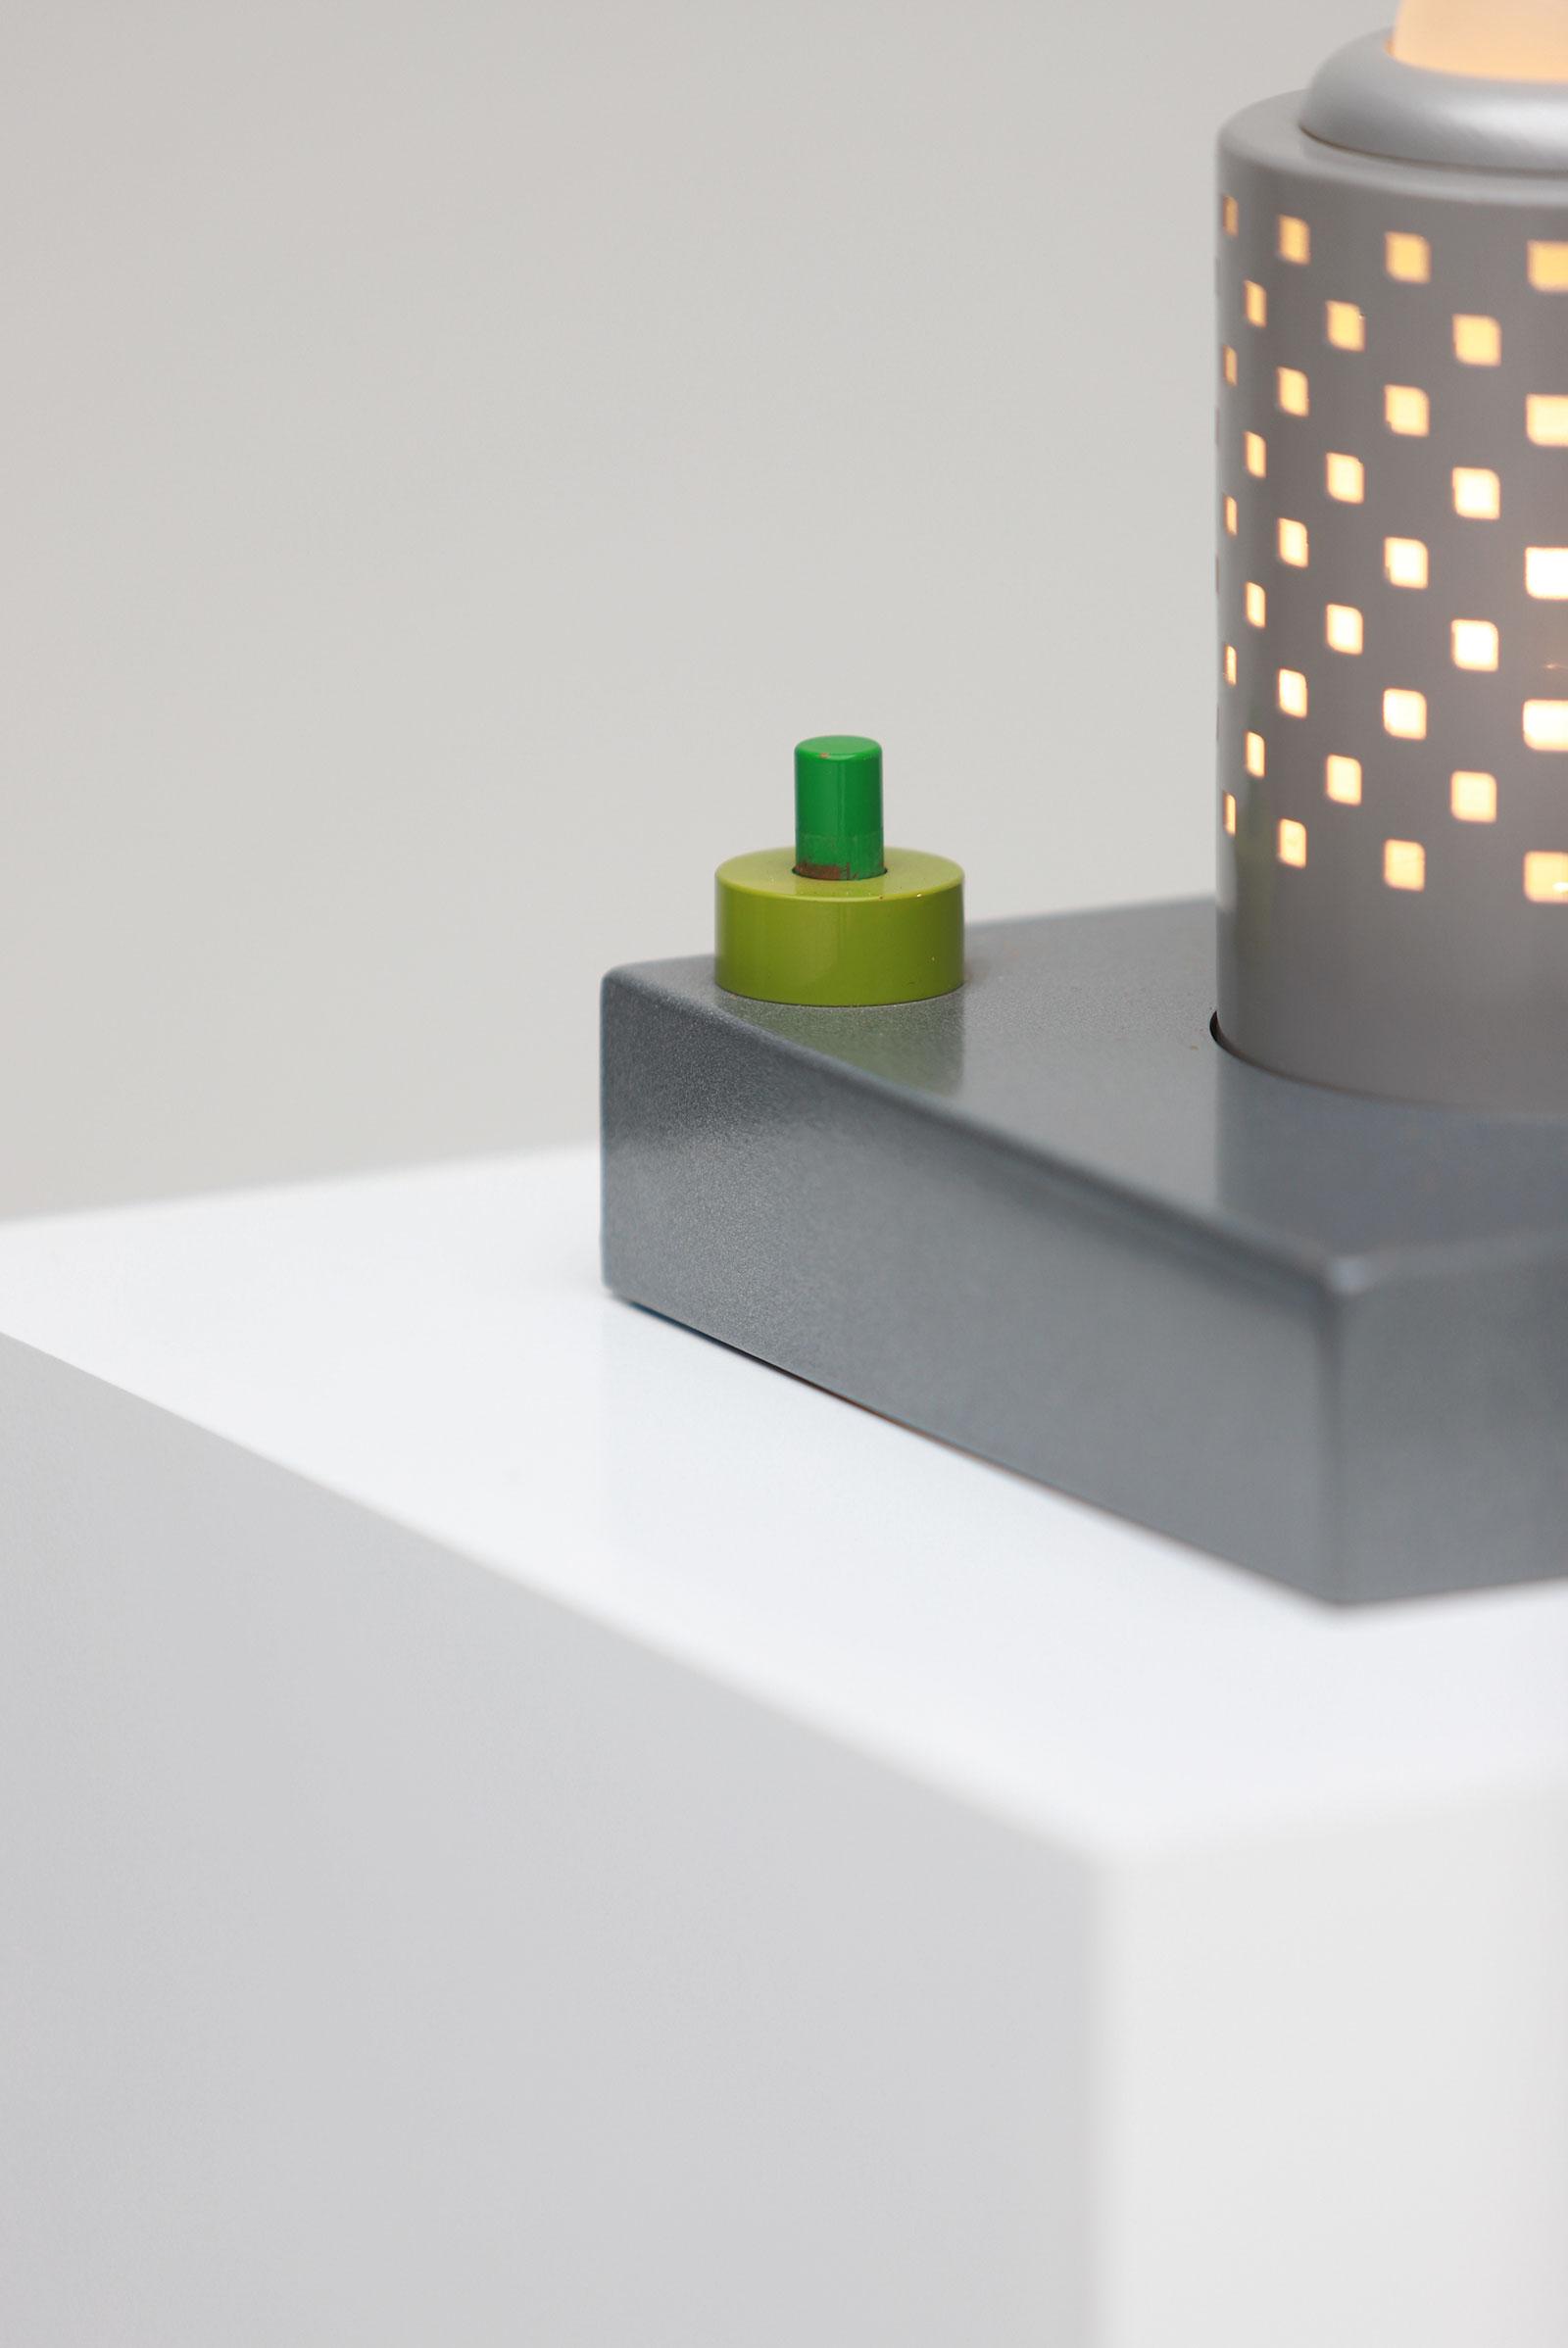 Matteo Thun Dieci Spargi table lampimage 3